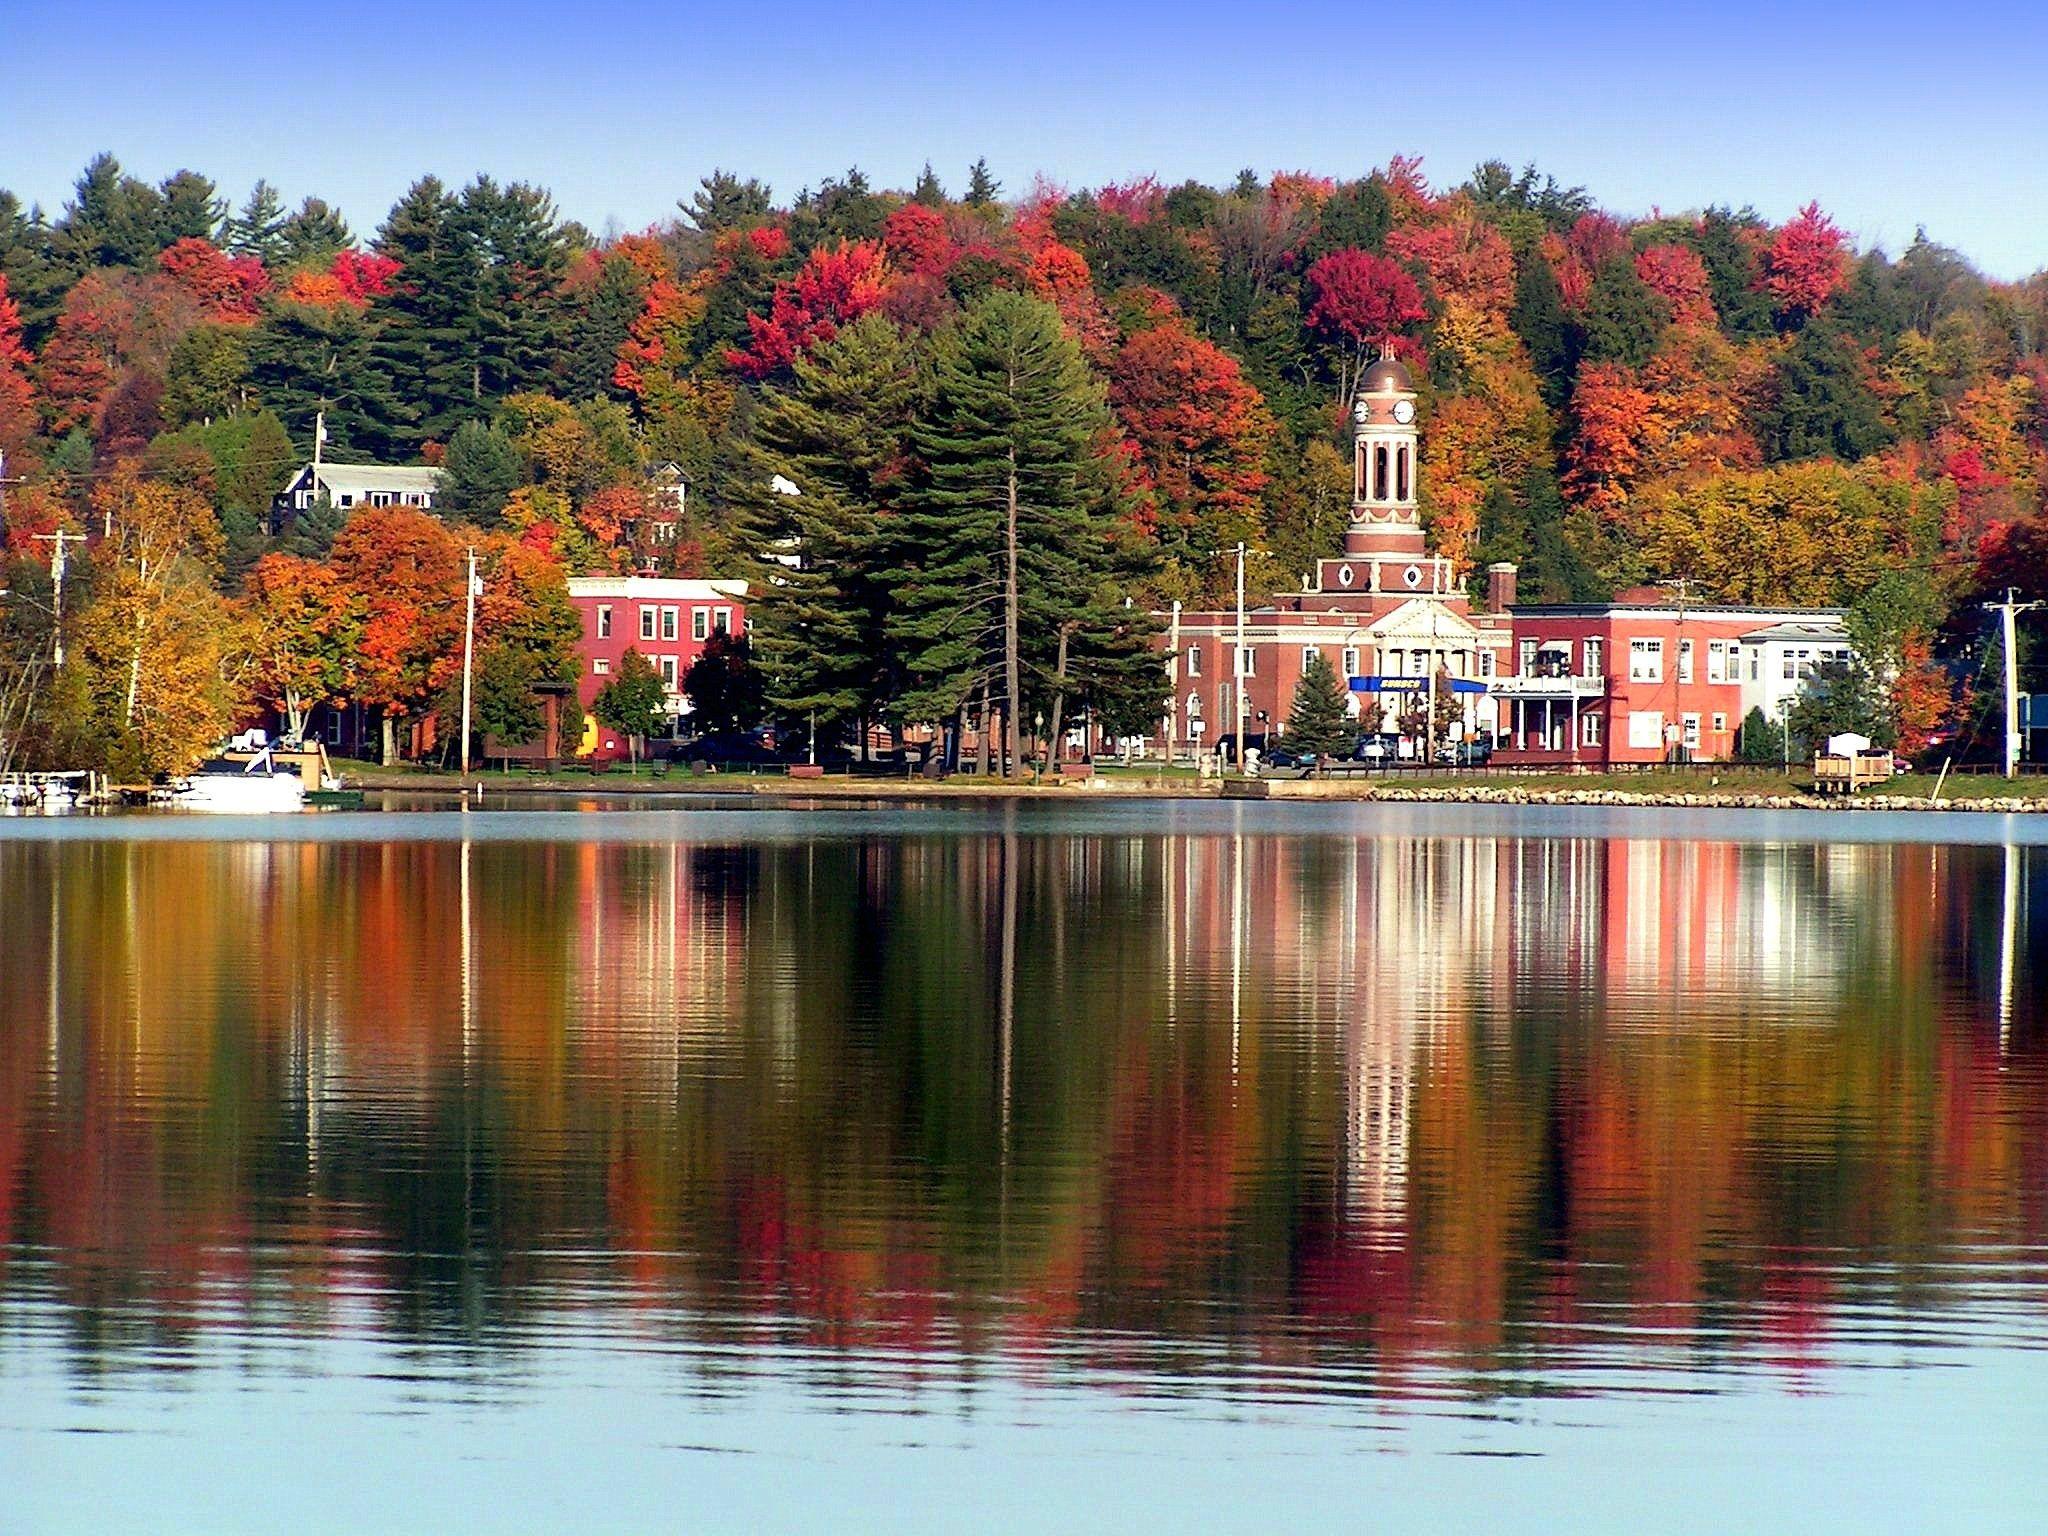 Lake Flower,Saranac Lake, NY, Hwy 3, Oct 8, 2004